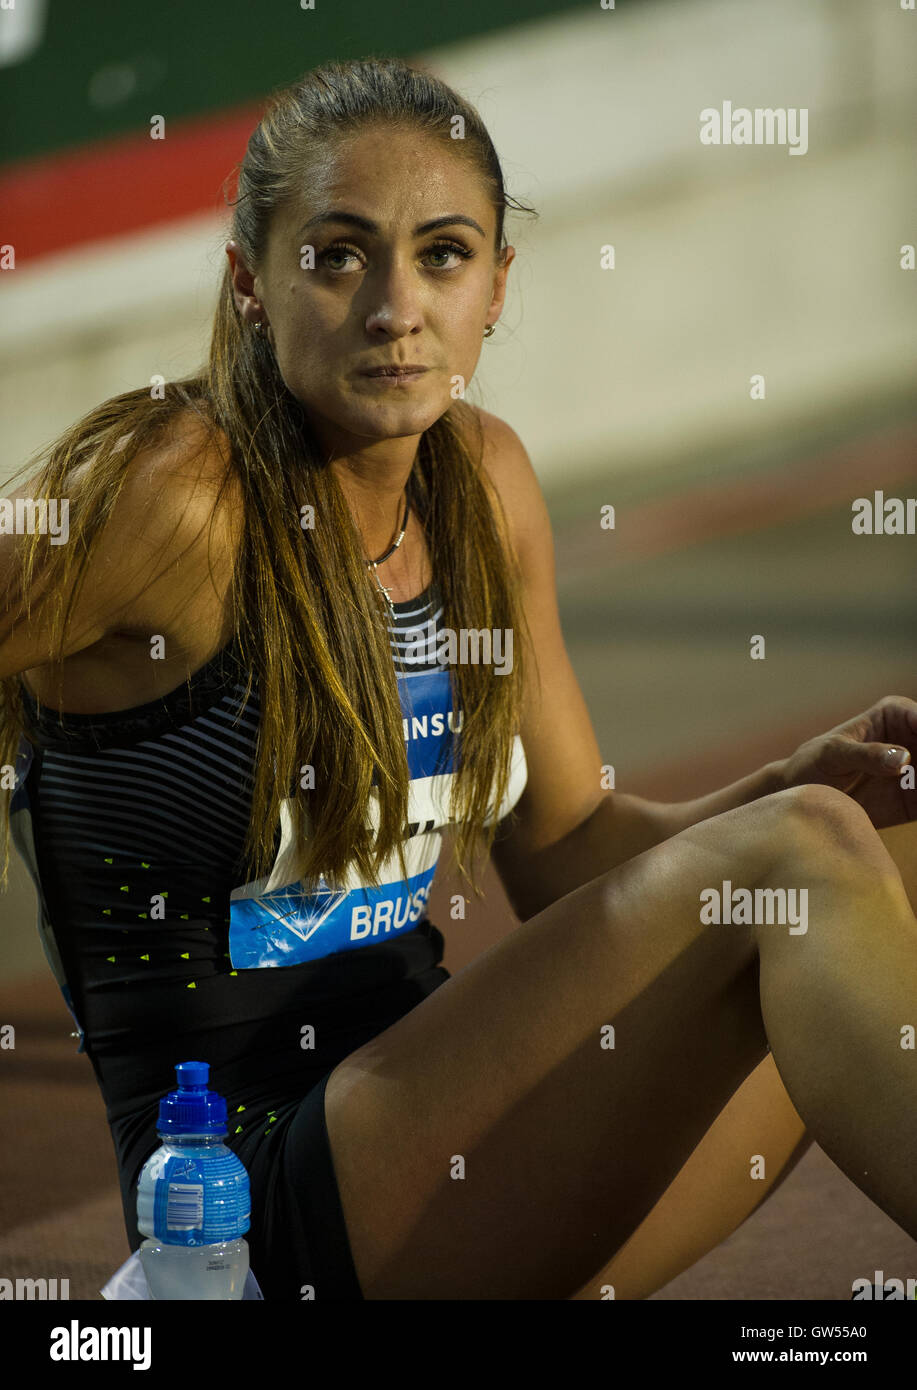 BRUSSELS, BELGIUM - SEPTEMBER 9: Olha Zemlyak competing in the Women's 400m at the AG Insurance Memorial Van - Stock Image